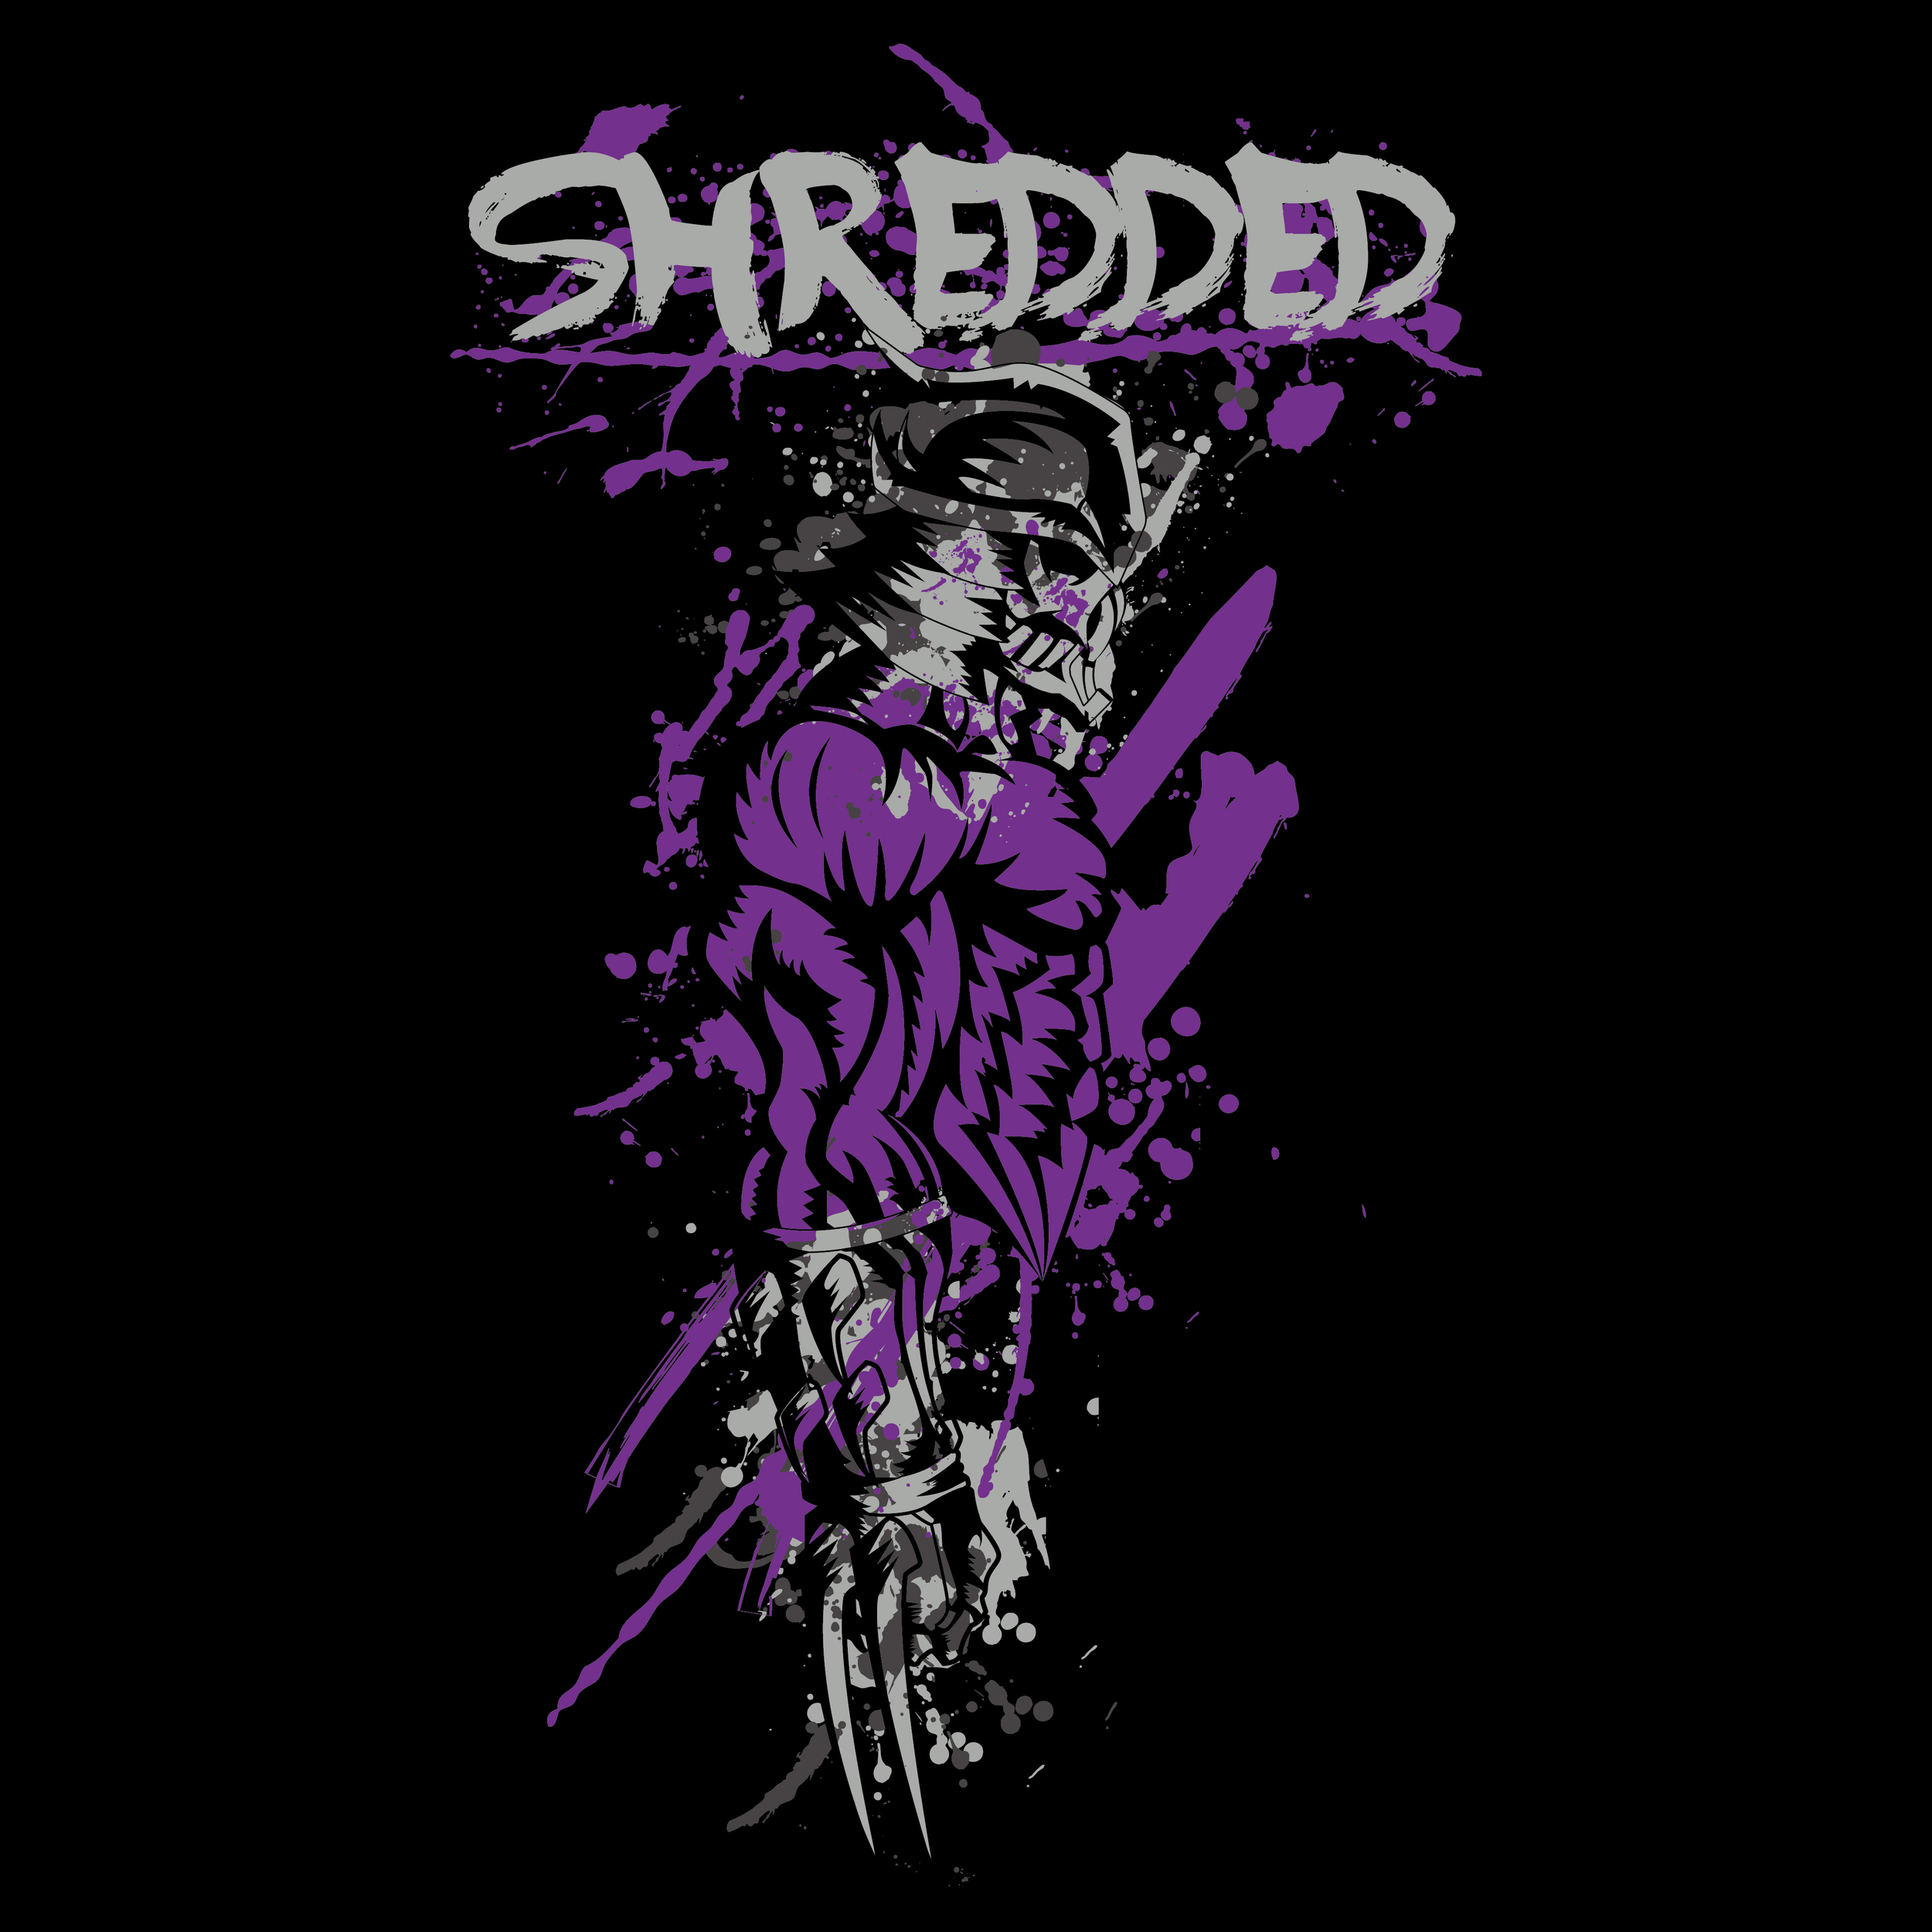 shredded-raskol-apparel-raskolapparel-black-tshirt-omarisuf-omar-isuf-roberto-orozco-artist-design-orozcodesign-studio-purple-silver-japanese-tmnt-shredder-comicbook-foot-clan-teenagemutantninjaturtle.jpg